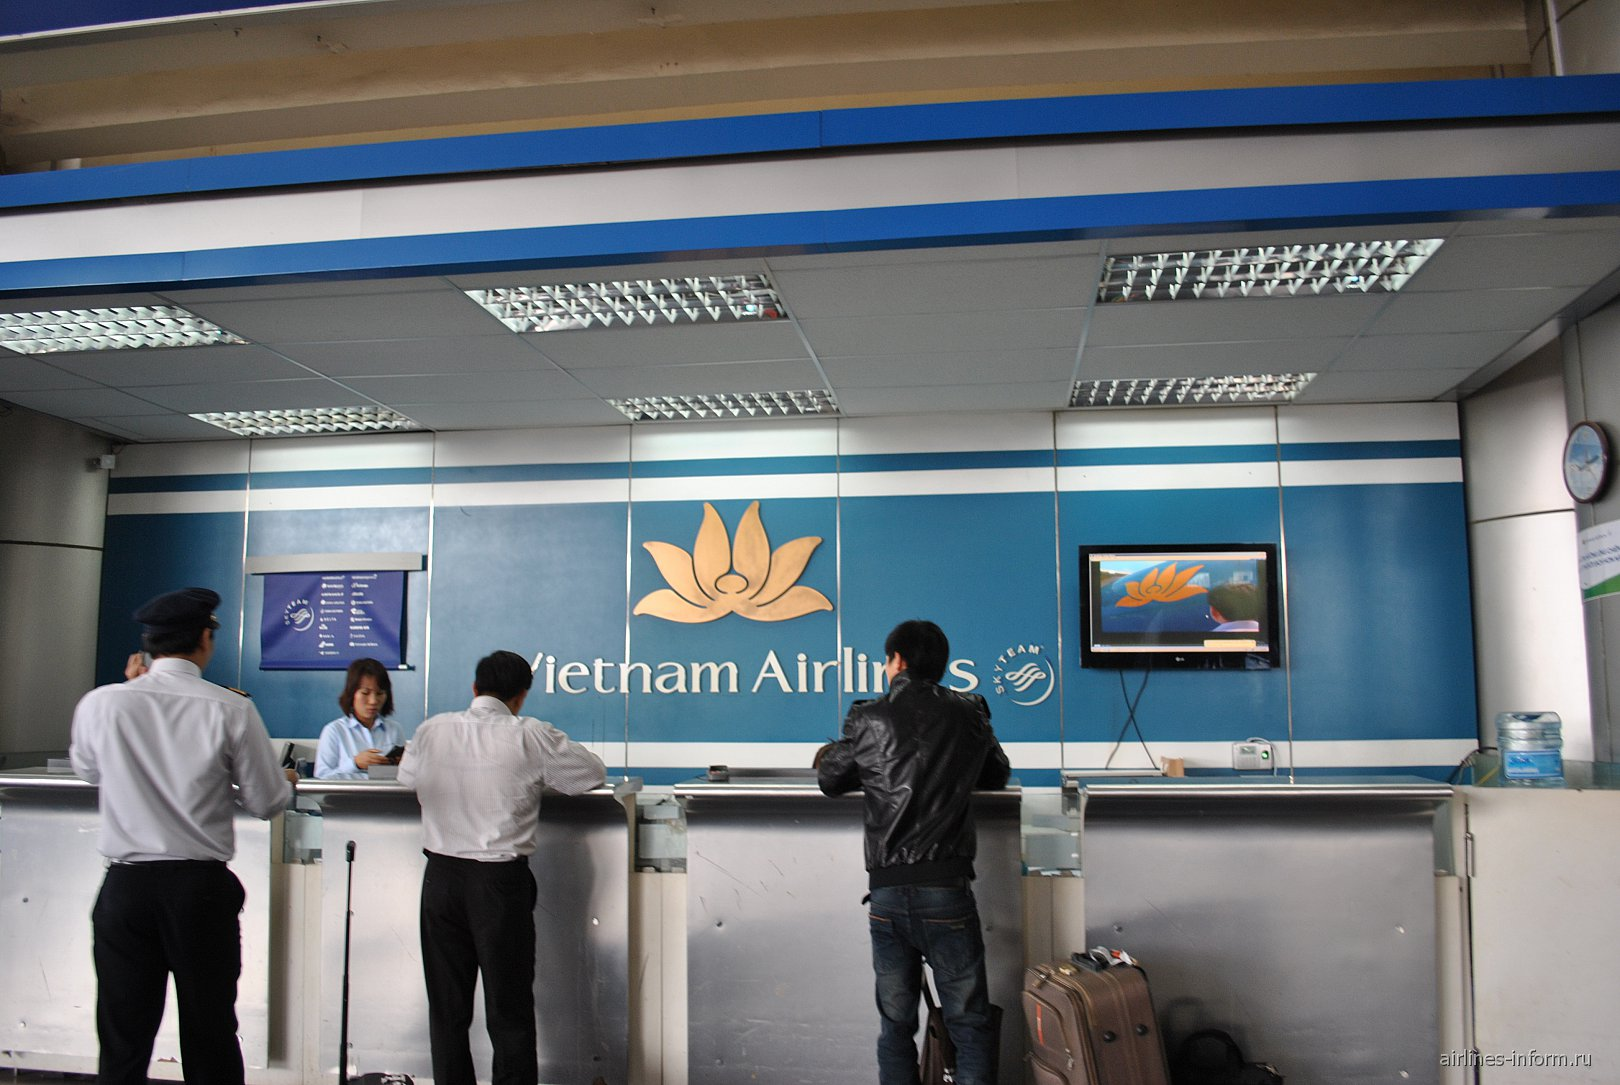 Представительство Вьетнамских авиалиний в аэропорту Ханоя